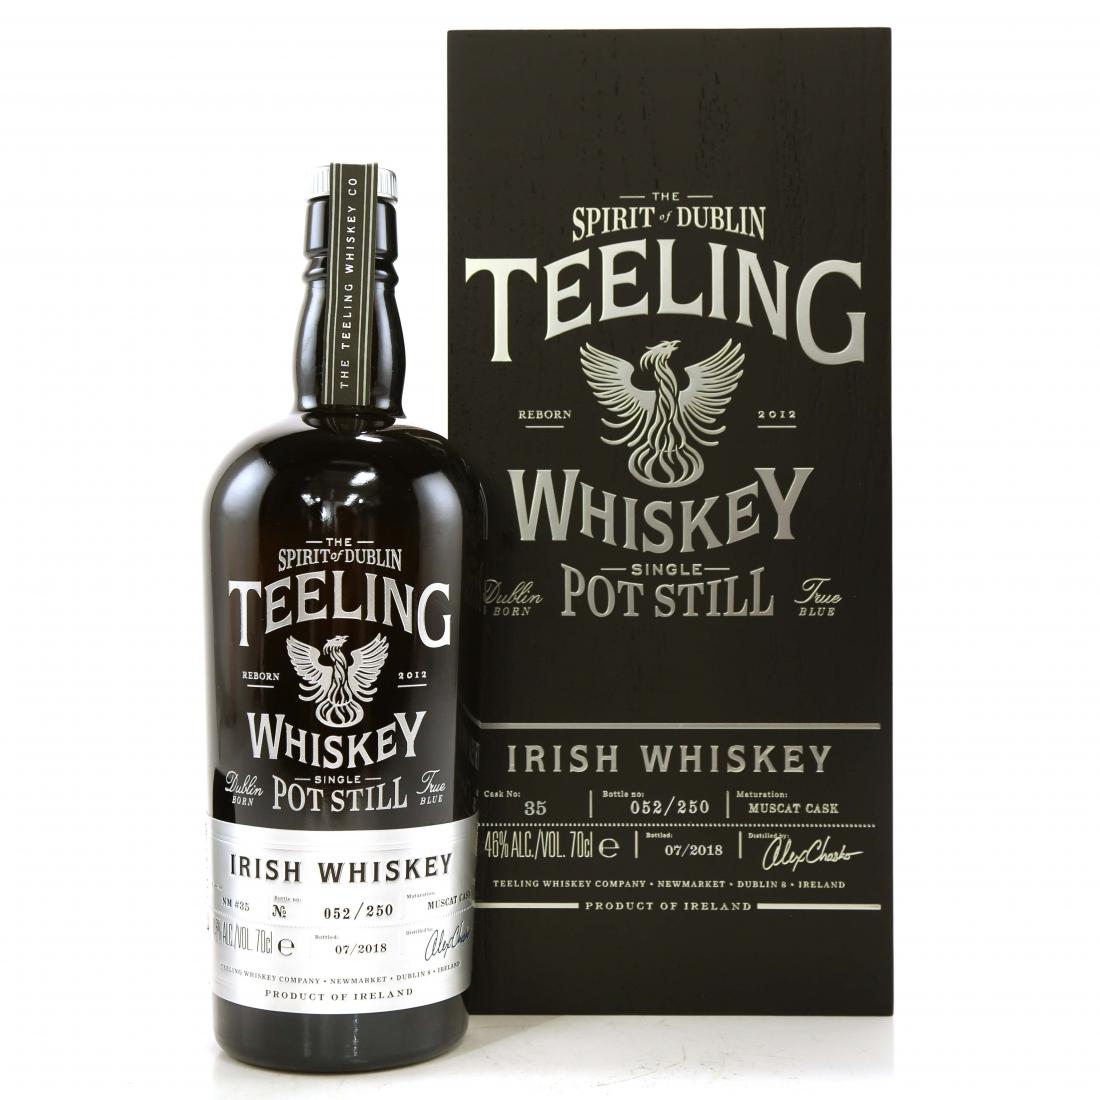 Teeling Celebratory Single Pot Still Whiskey / Bottle #052